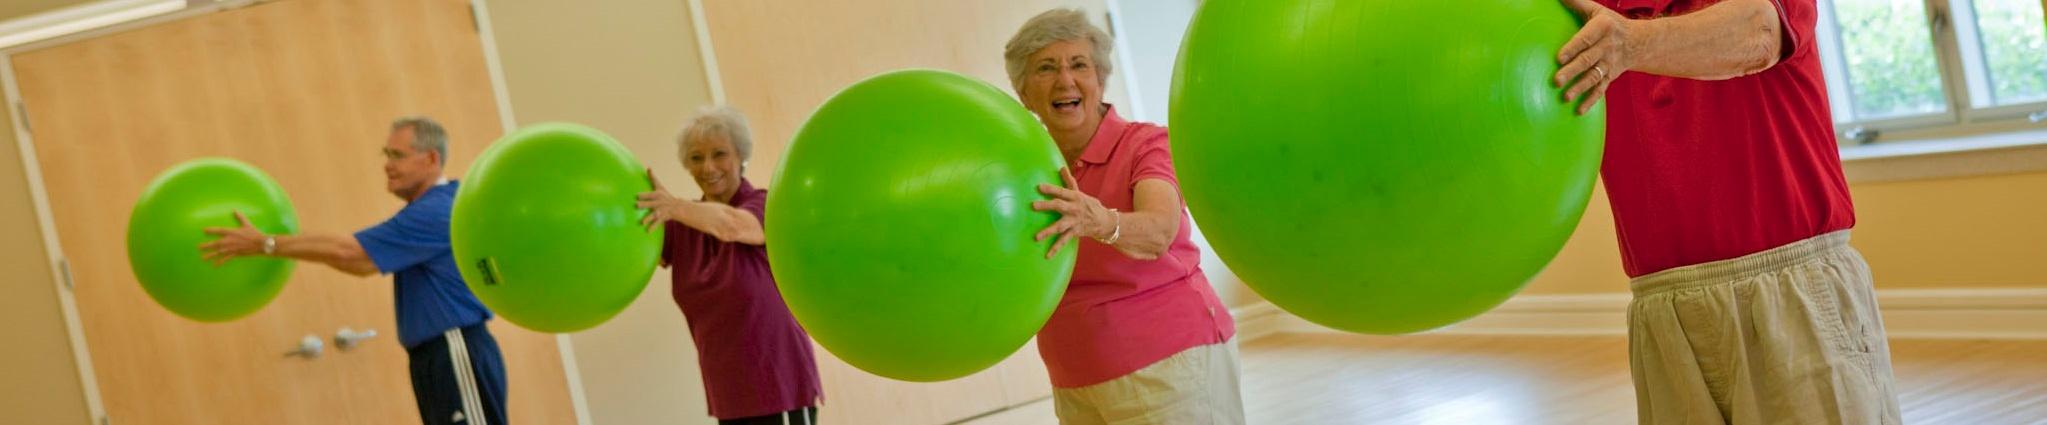 NIFS | Senior Group Fitness